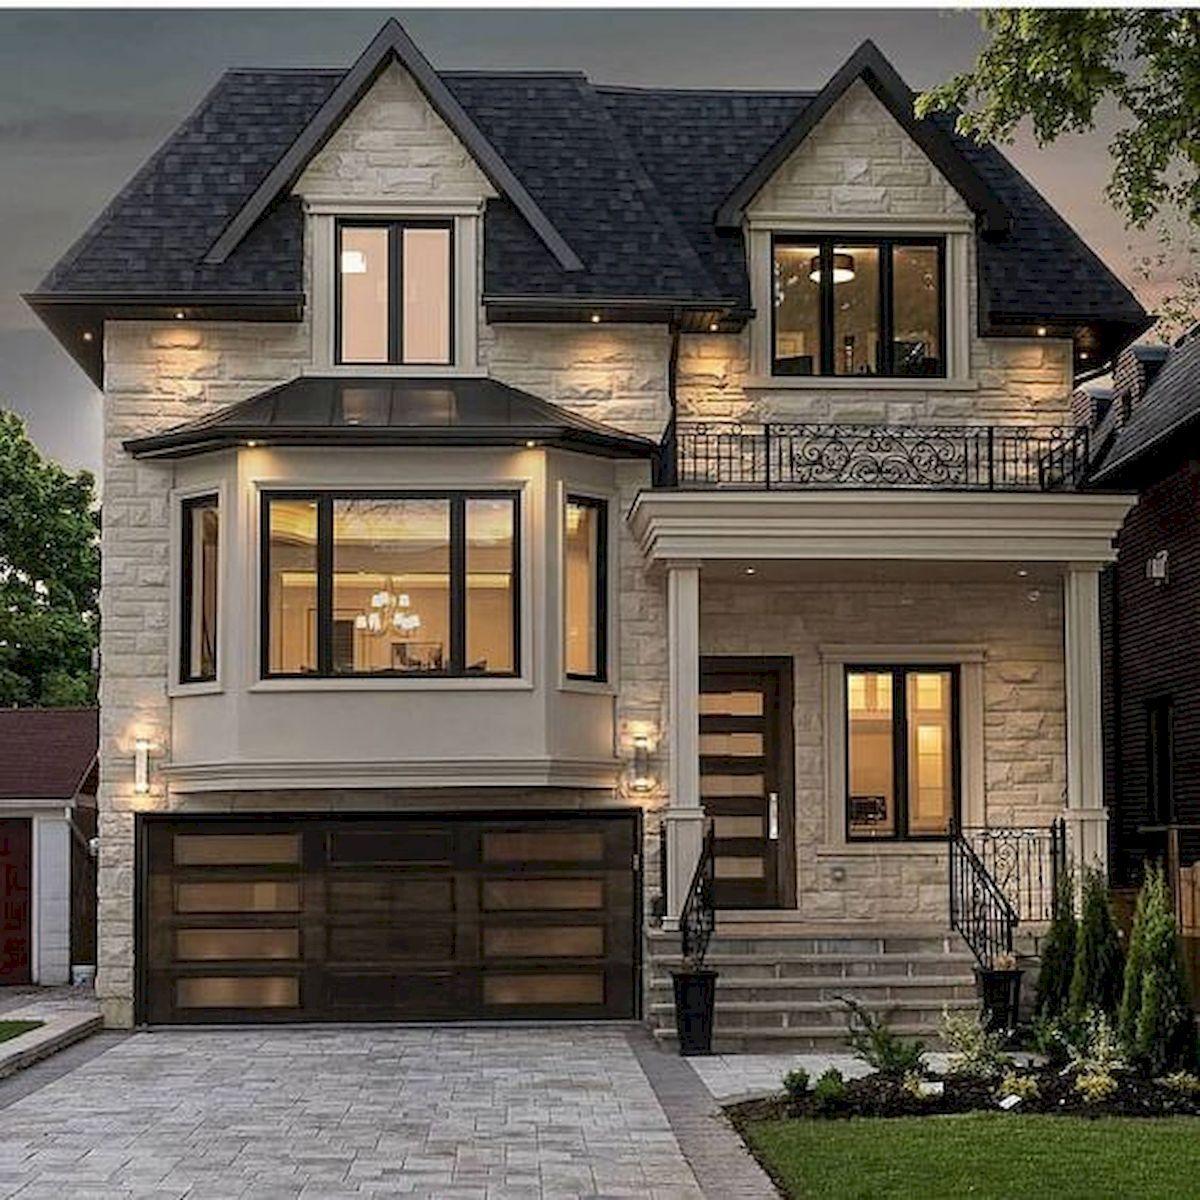 70 most popular dream house exterior design ideas house on most popular modern dream house exterior design ideas the best destination id=94558